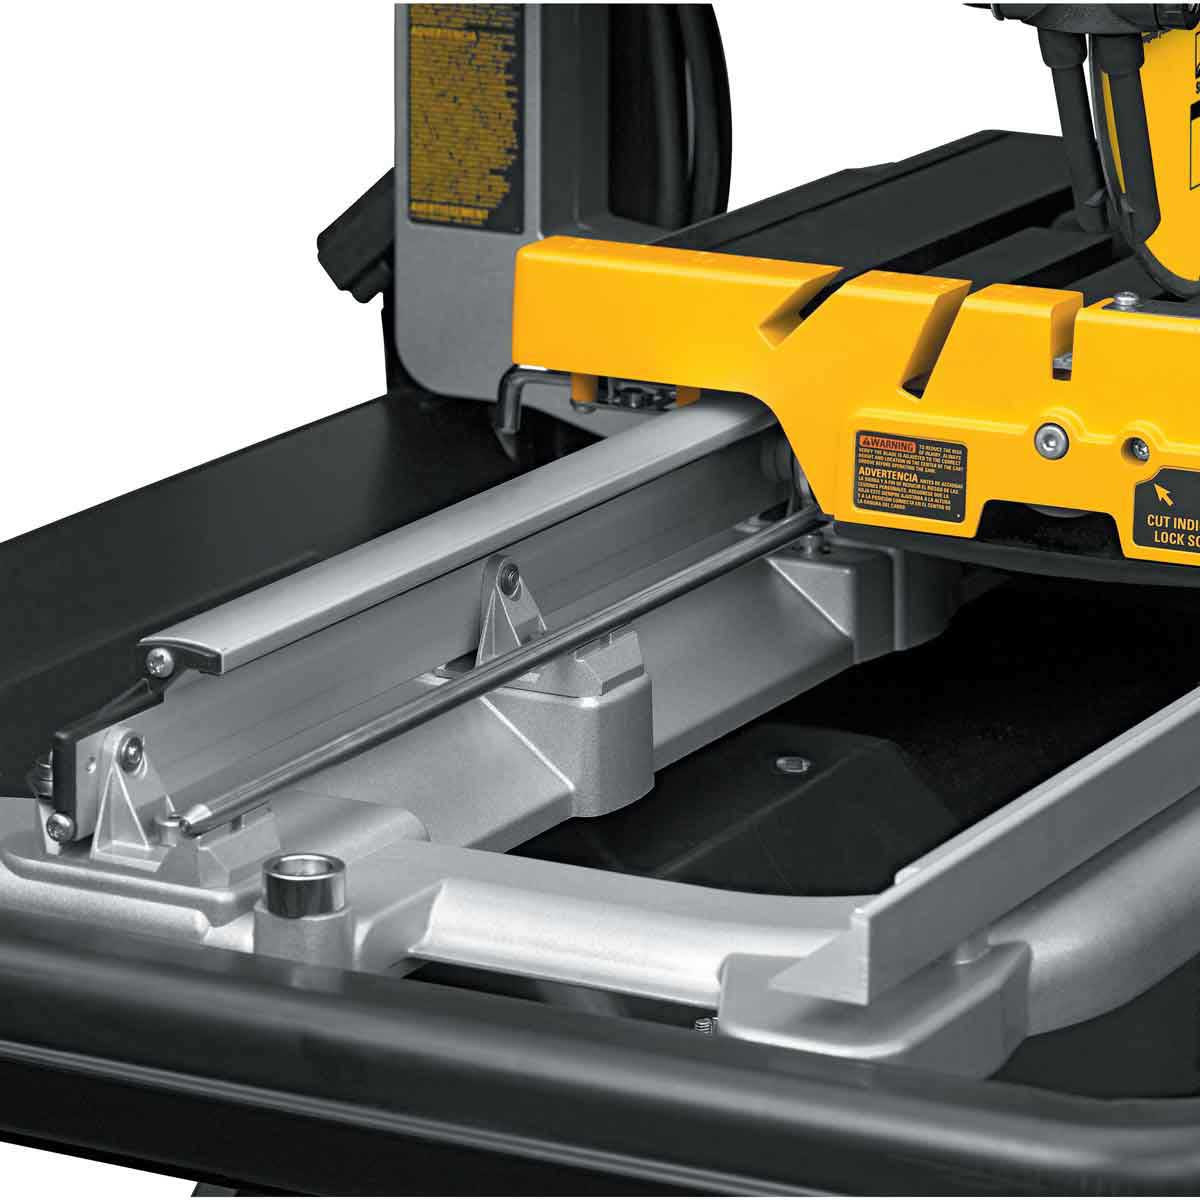 Dewalt D24000 45 angle capacity